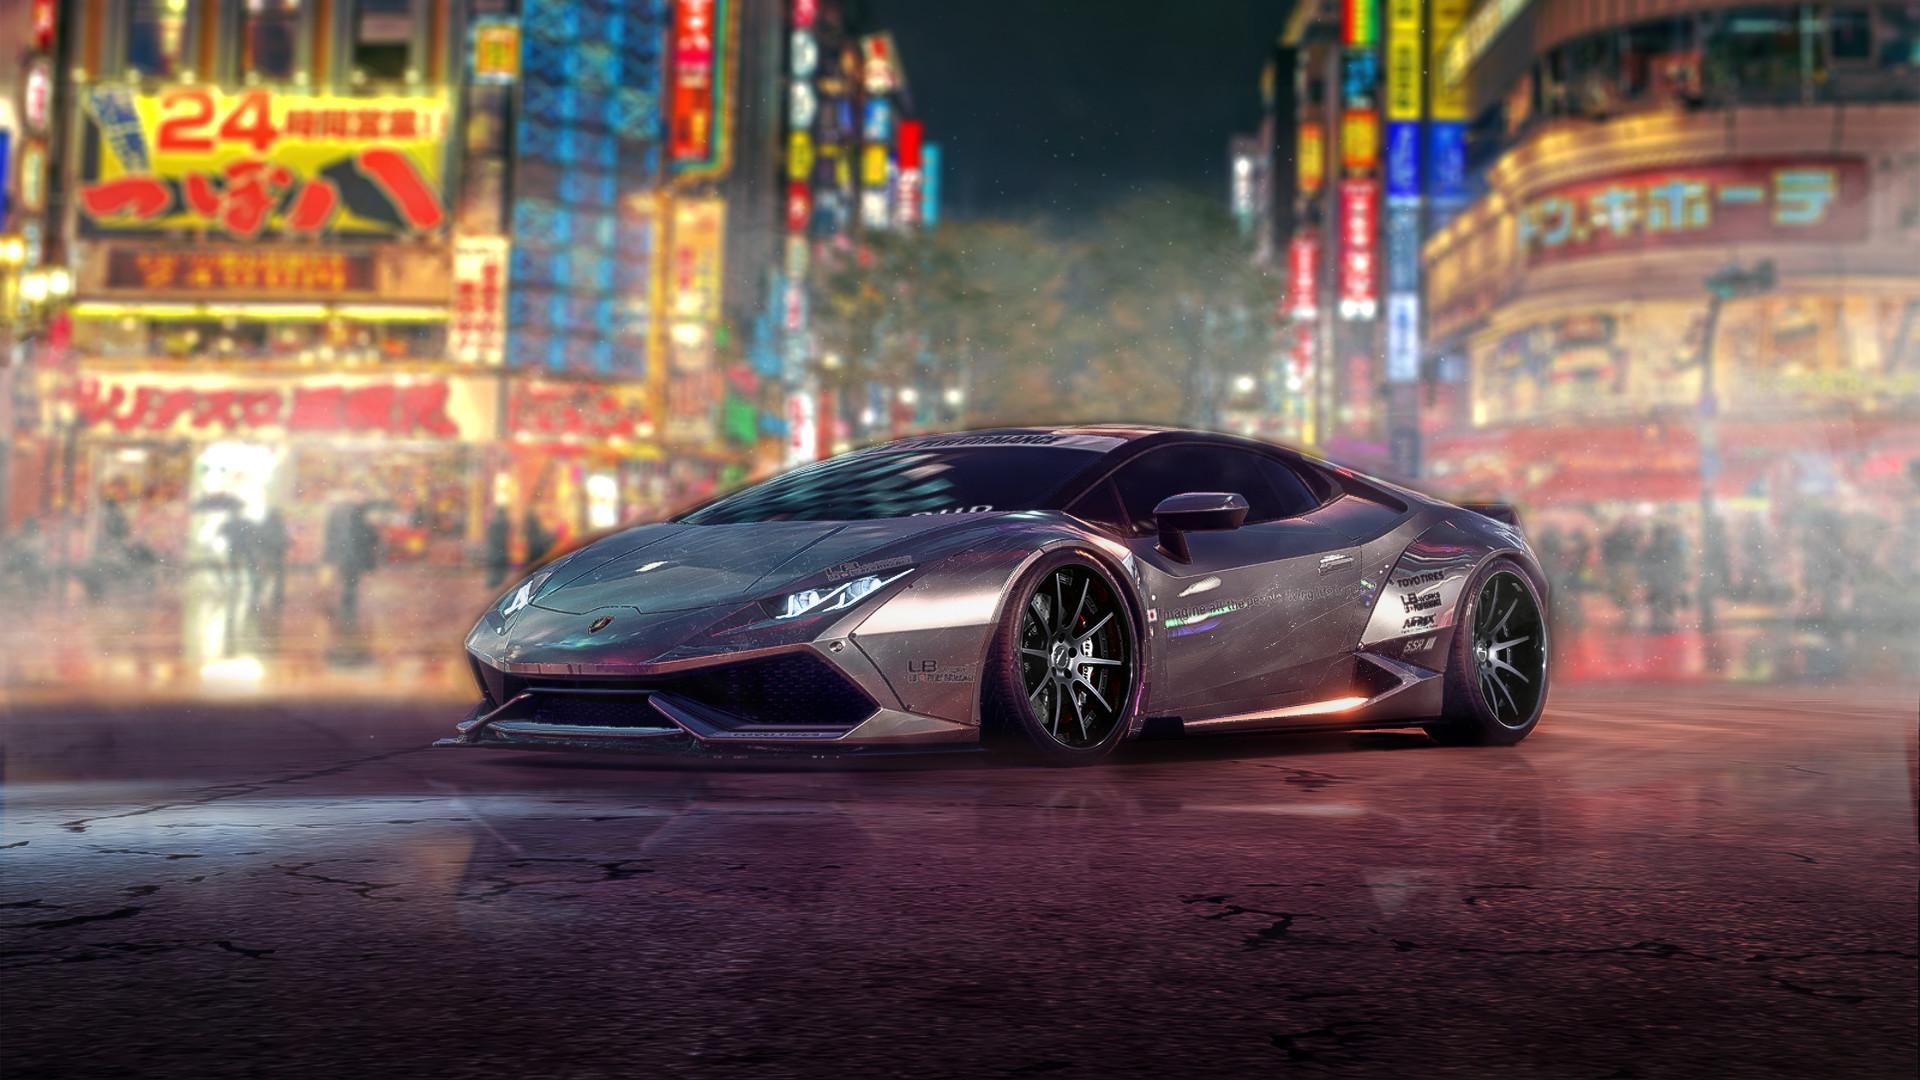 Ferrari Sports Cars Wallpapers Hd Nfs Payback Lamborghini Hd Cars 4k Wallpapers Images